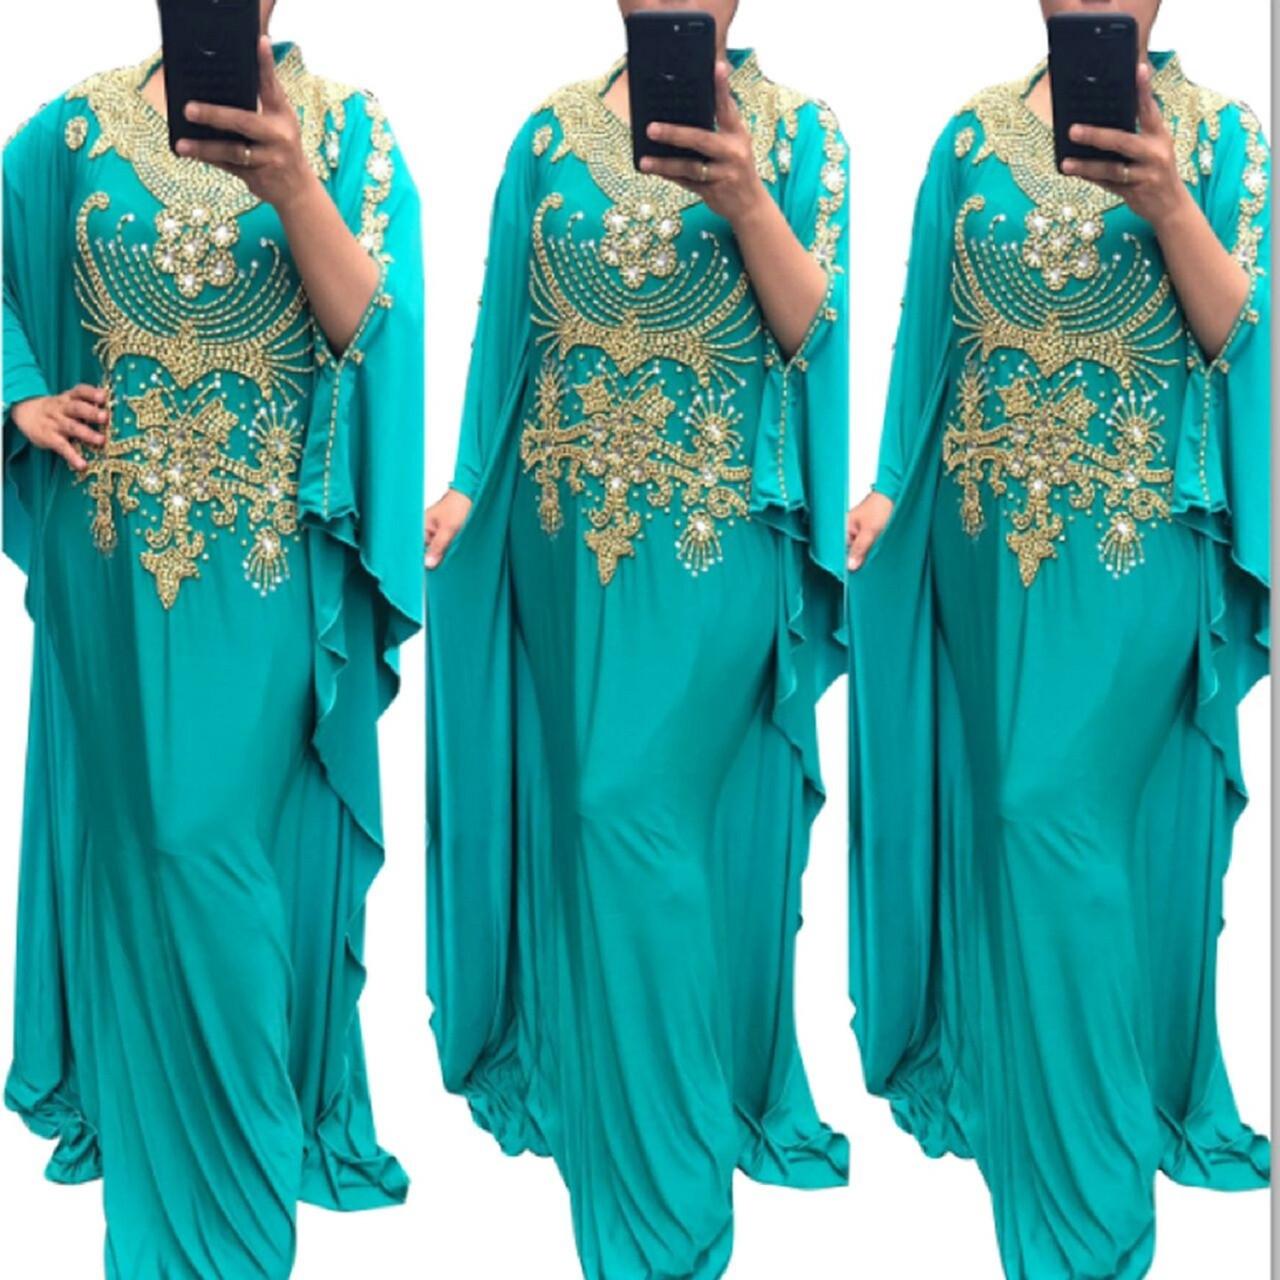 361b49aad2 ... Evening Dresses Wedding Dress Cocktail Plus size 5505. Price   59.99.  Image 1